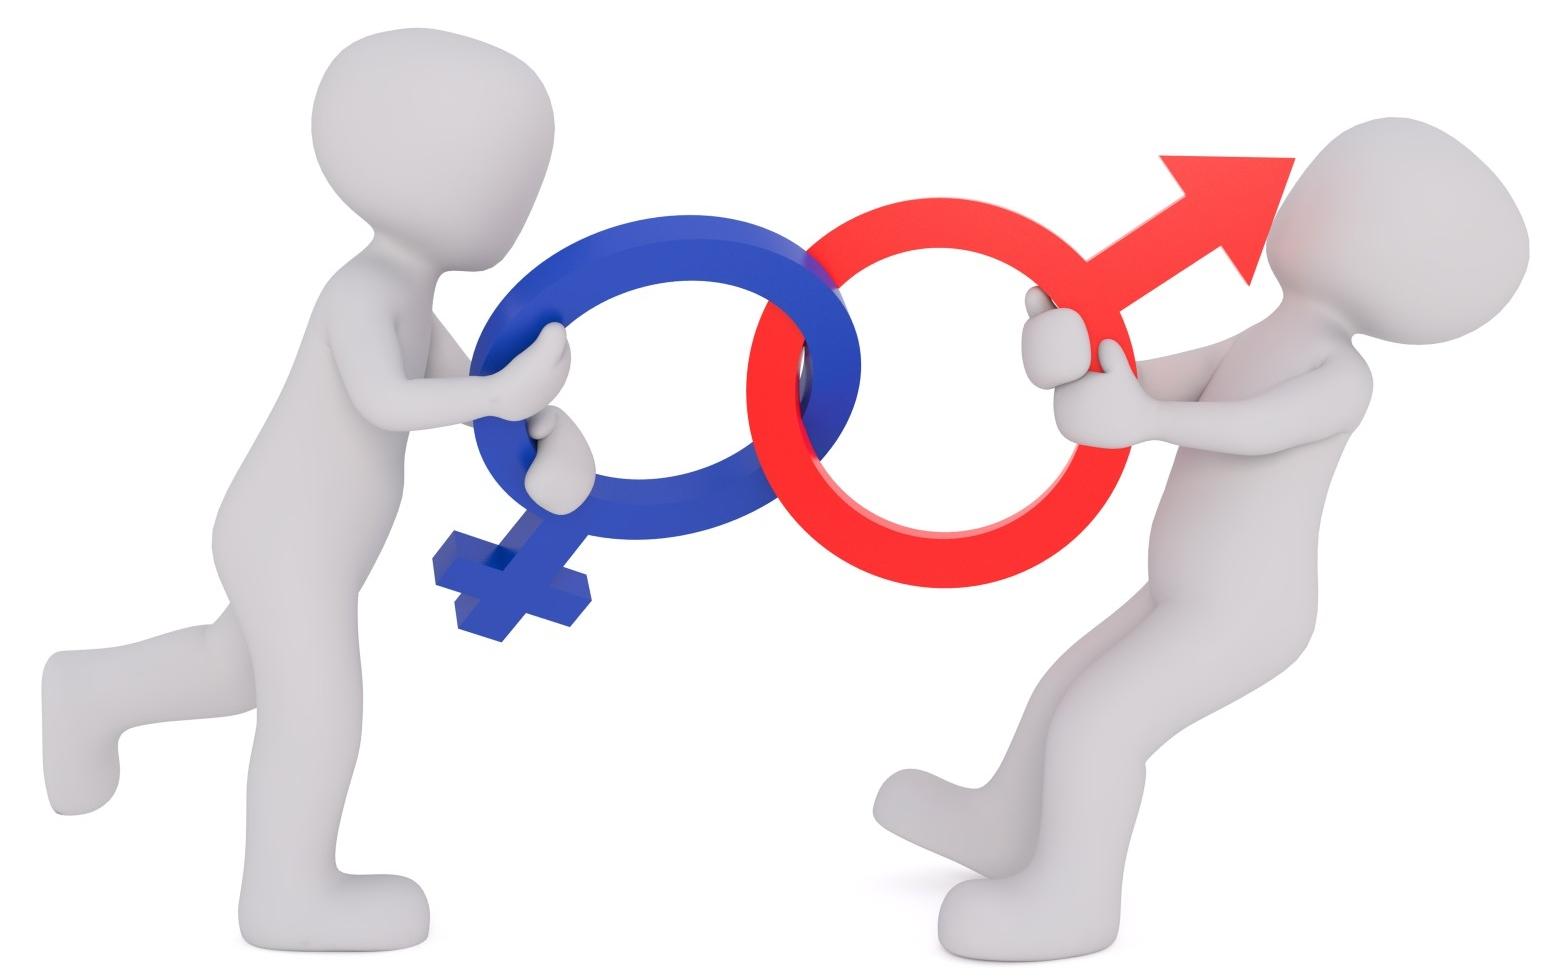 ecriture-inclusive-parite-homme-femme